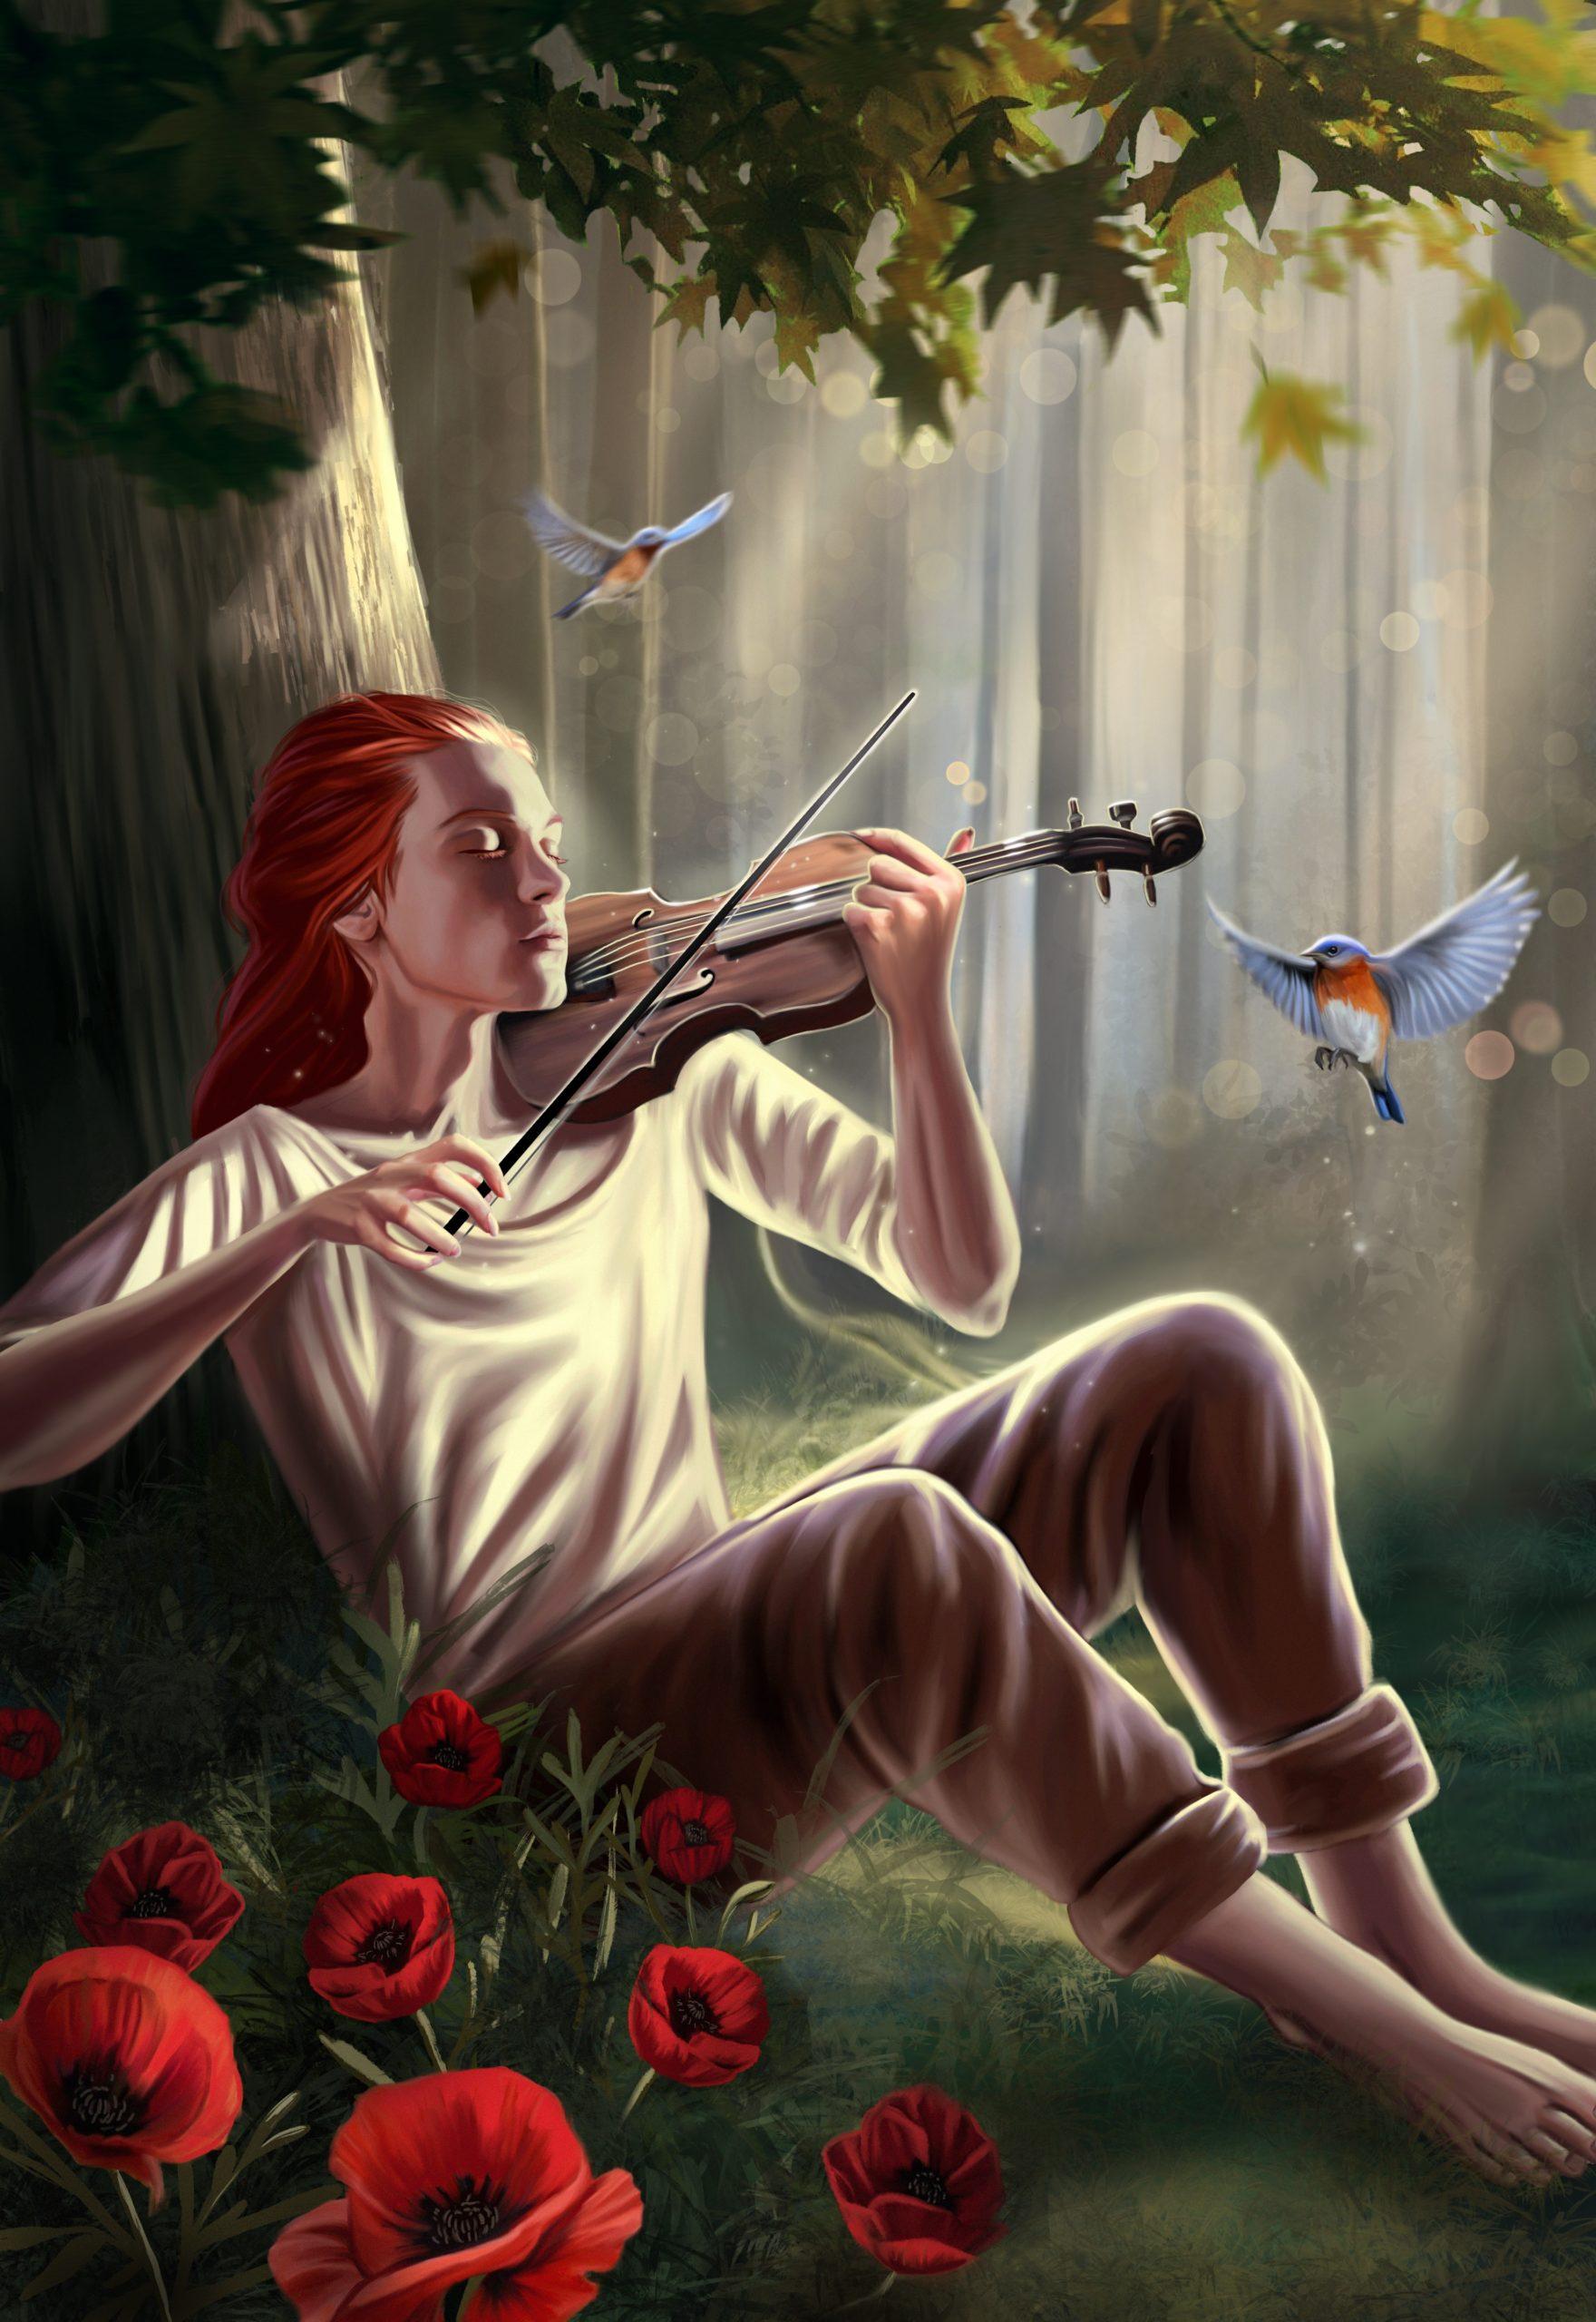 Vivaldi Four Seasons student artwork from MassArt, Lauren Richelieu